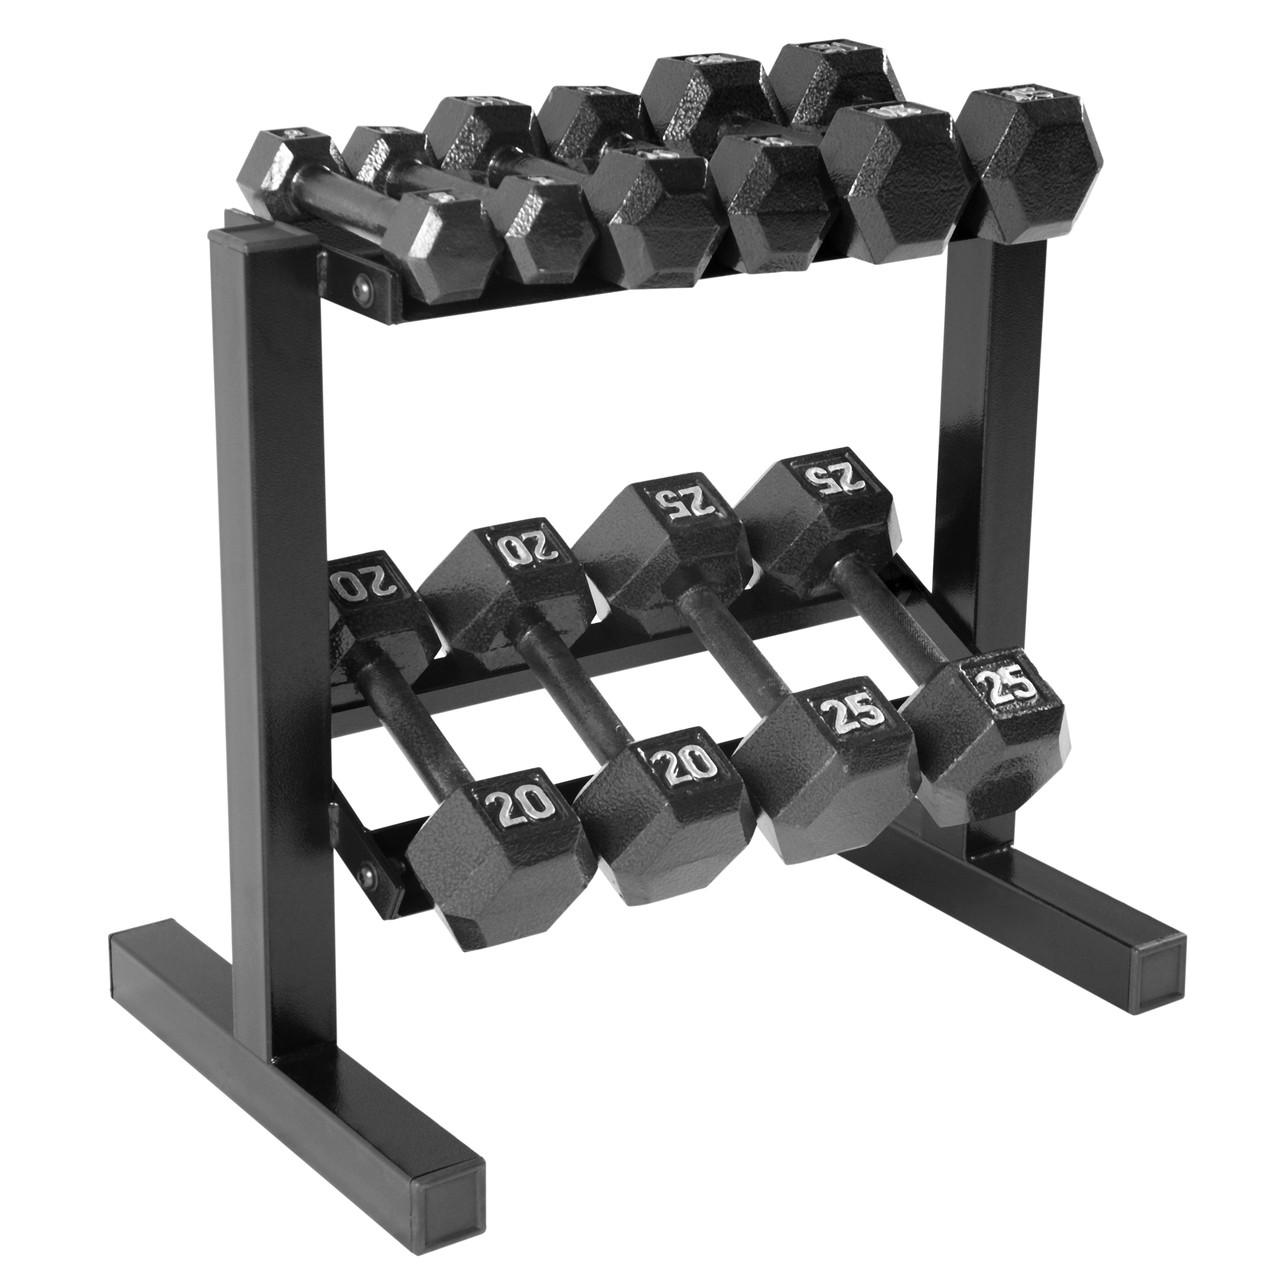 168dbf39c 150 lb CAP Black Cast Iron Hex Dumbbell Set with Rack